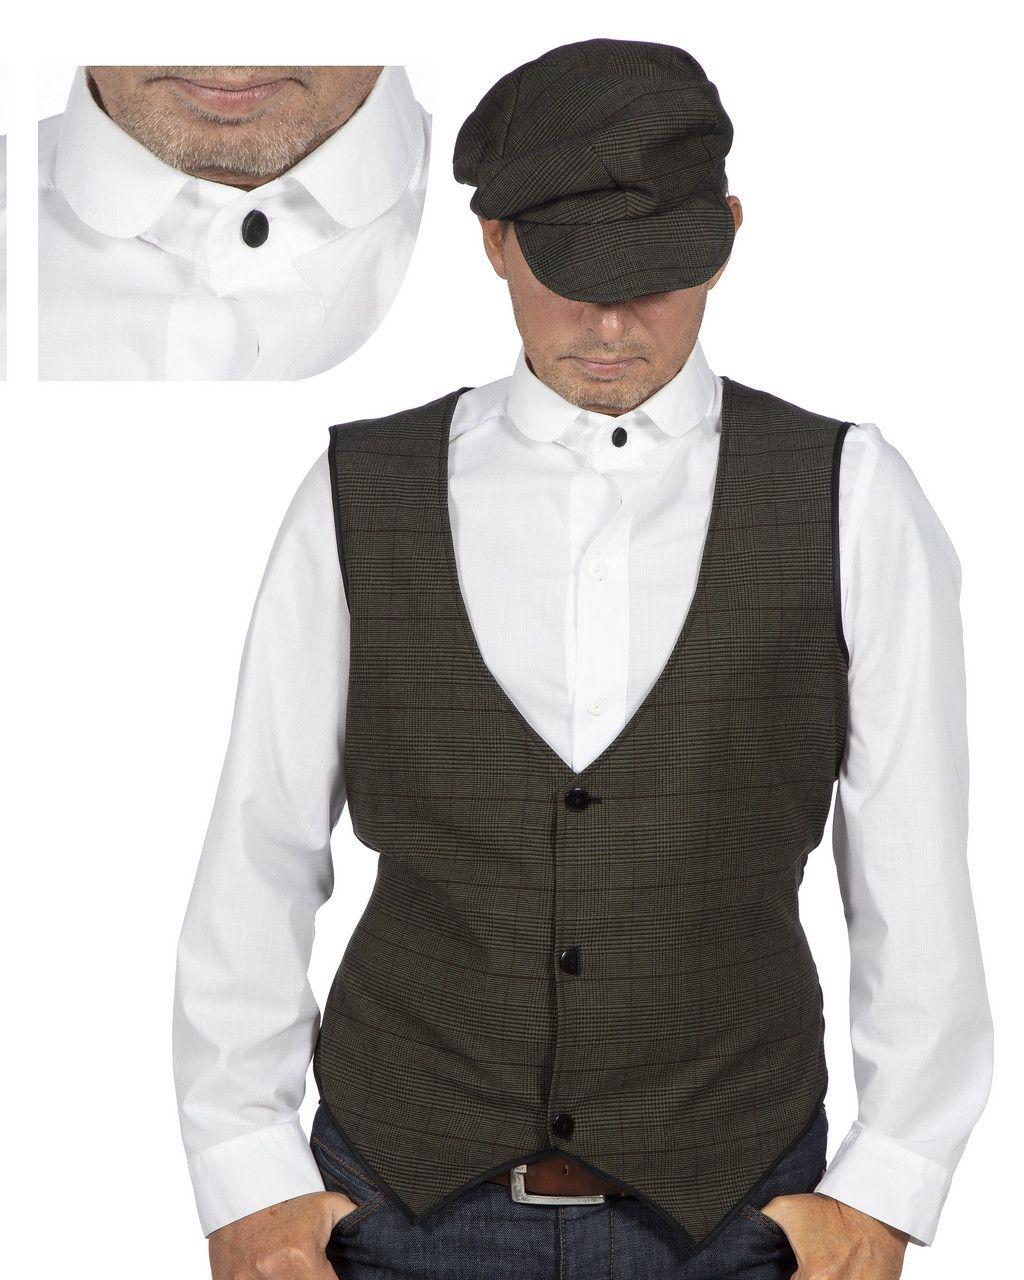 Roaring 20s Overhemd Met Stijve Boord Man